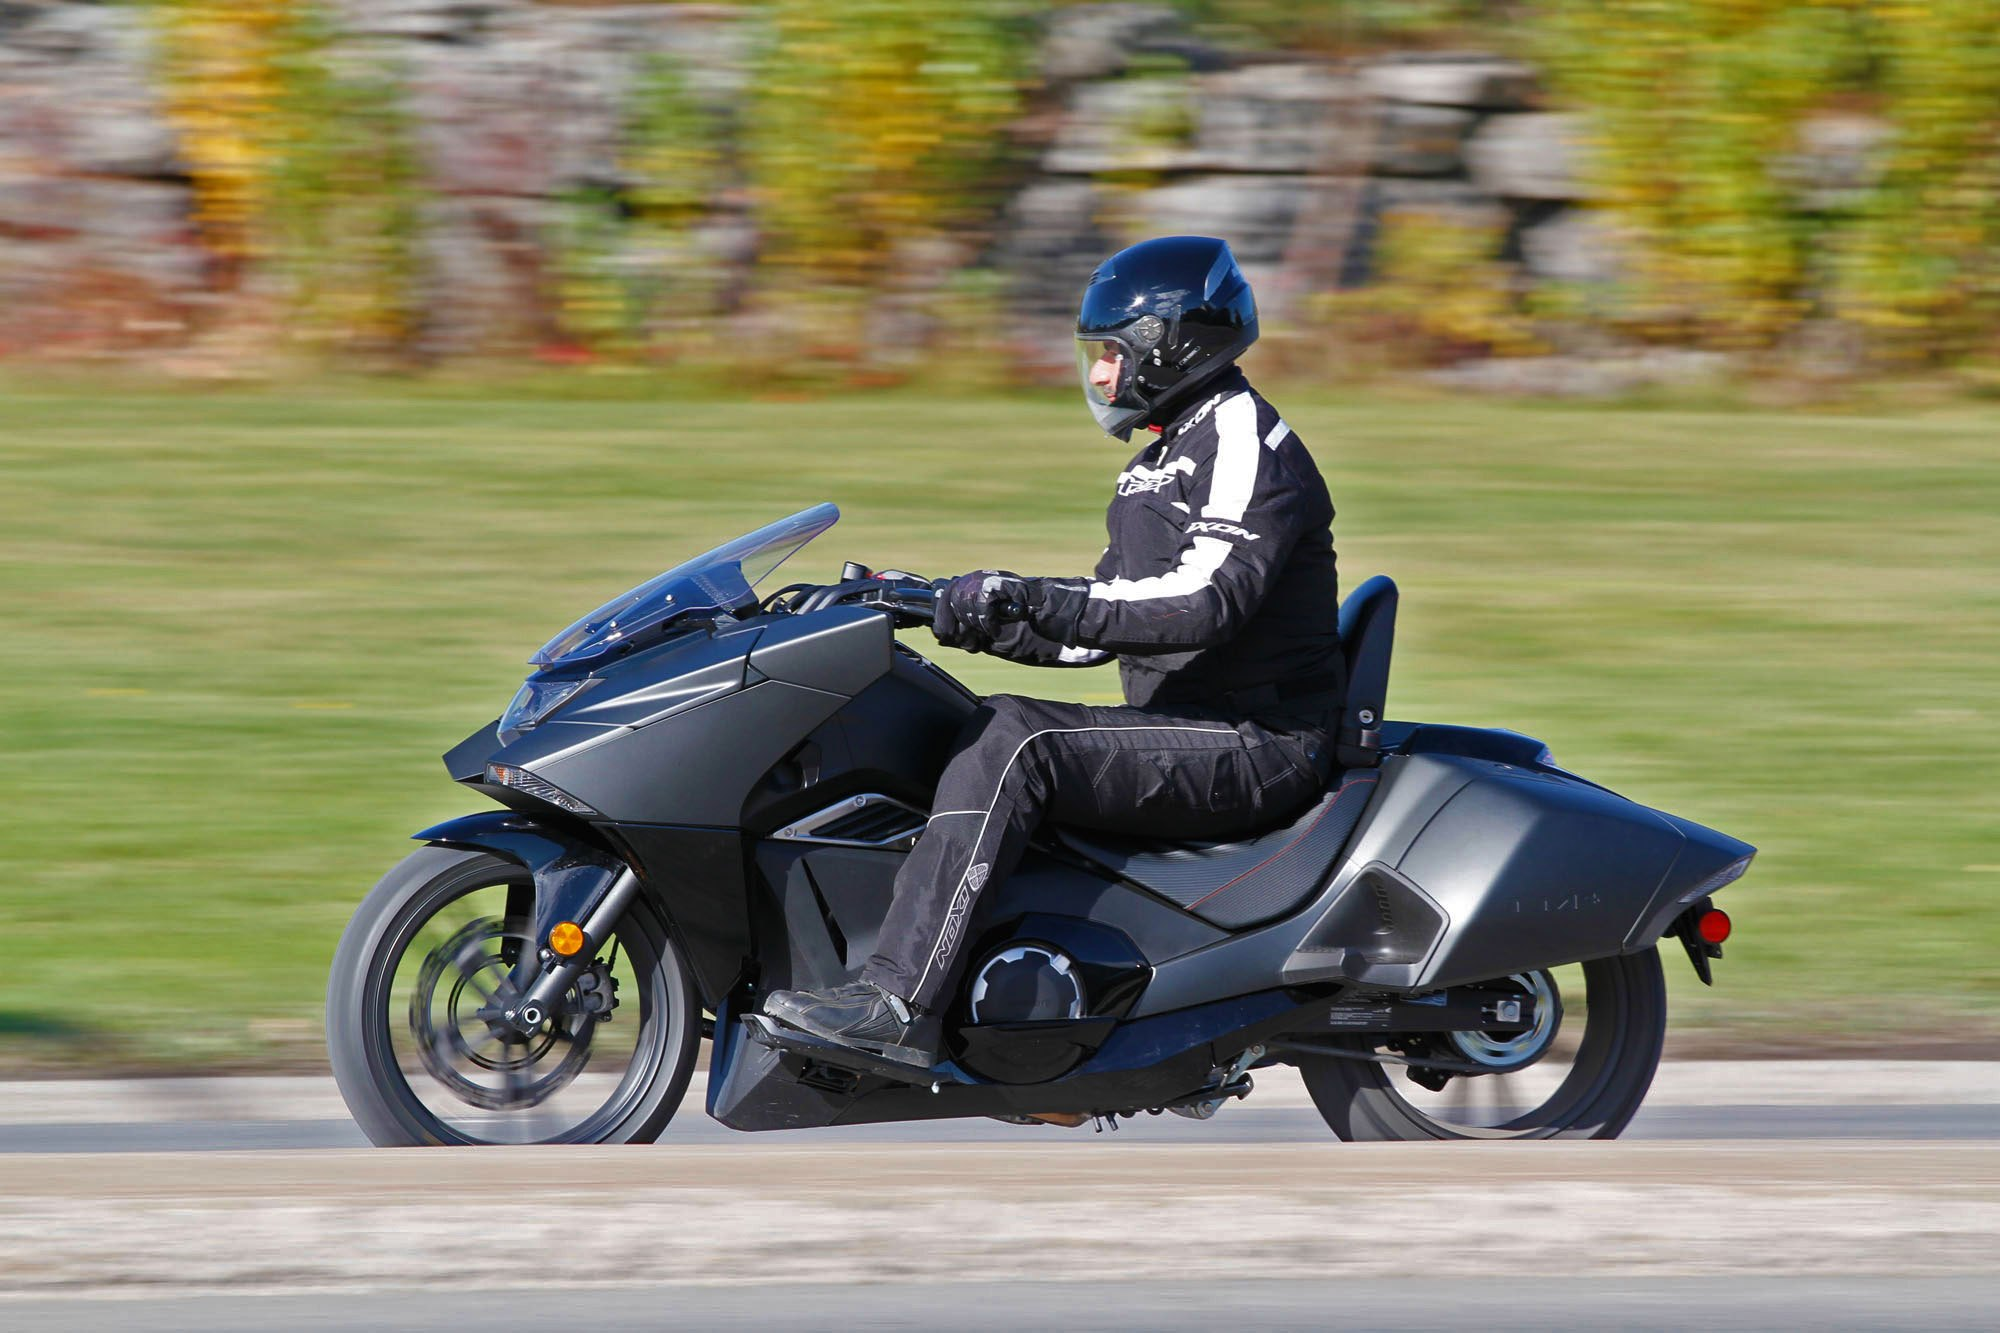 2015_Honda_NM4_ride_lhs.jpg